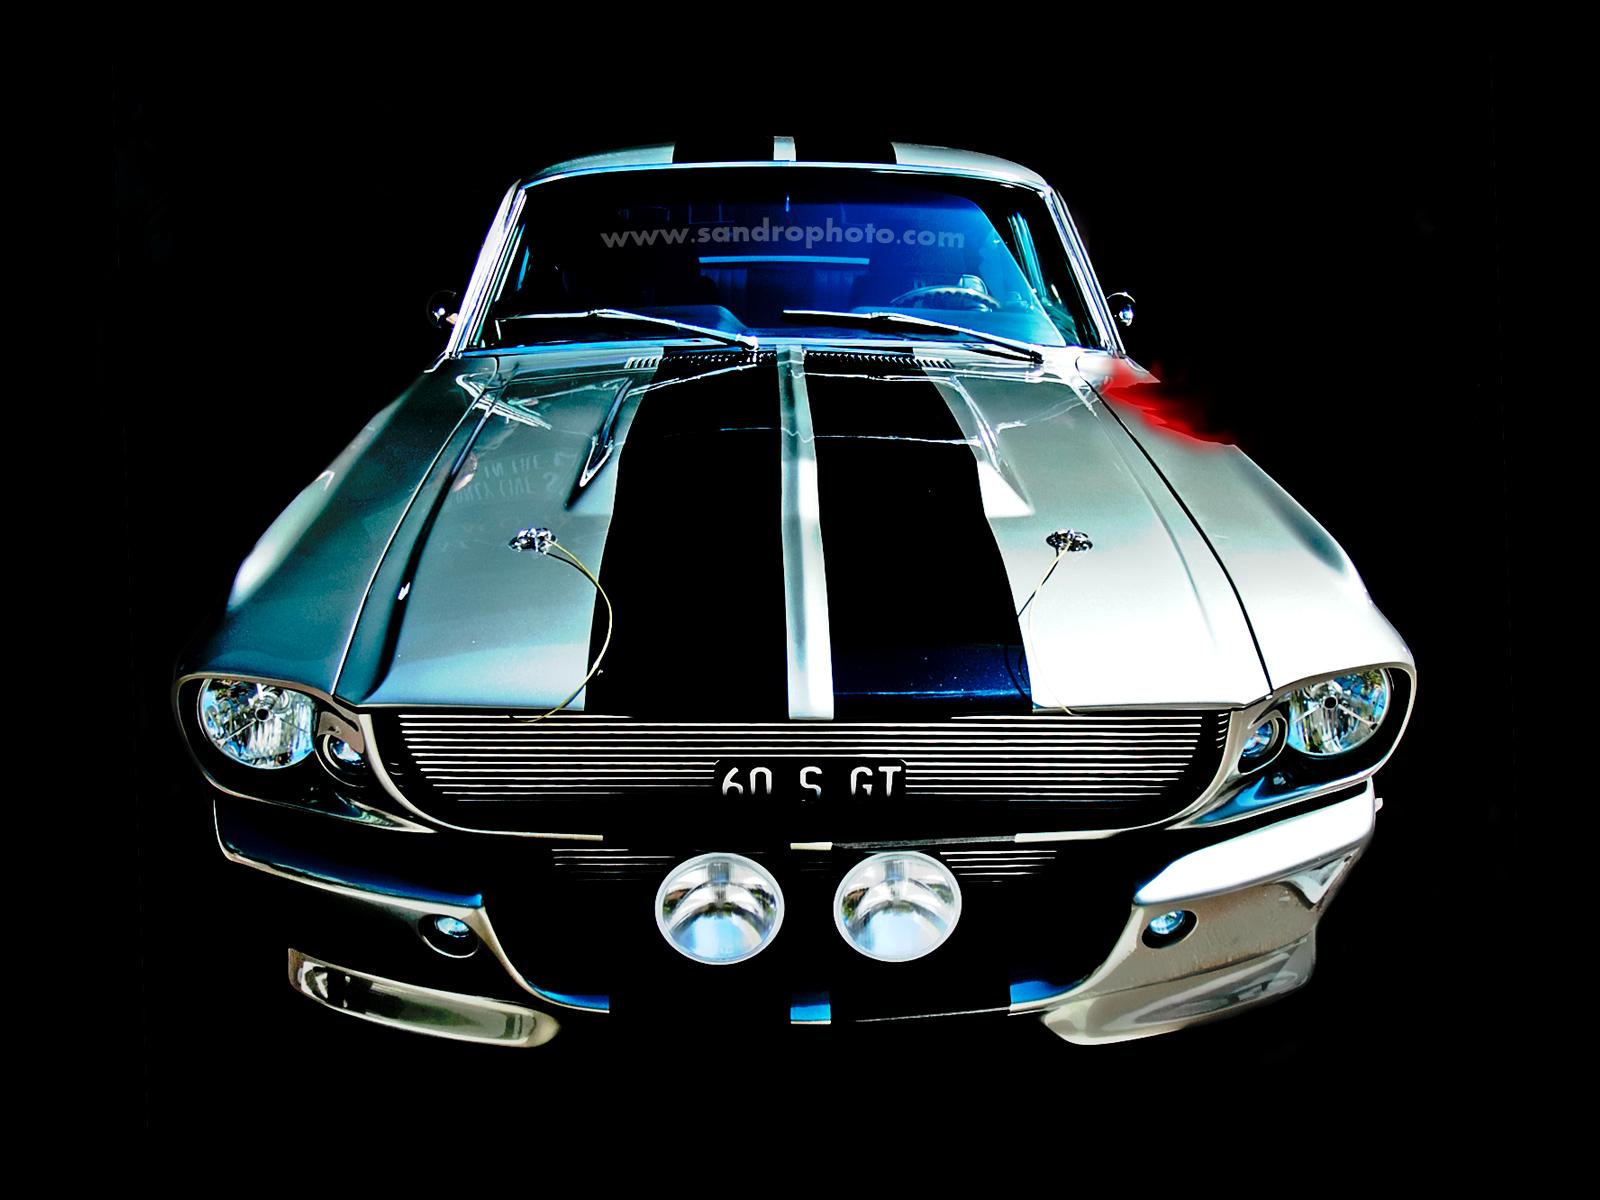 Muscle car wallpaper 2012 Its My Car Club 1600x1200